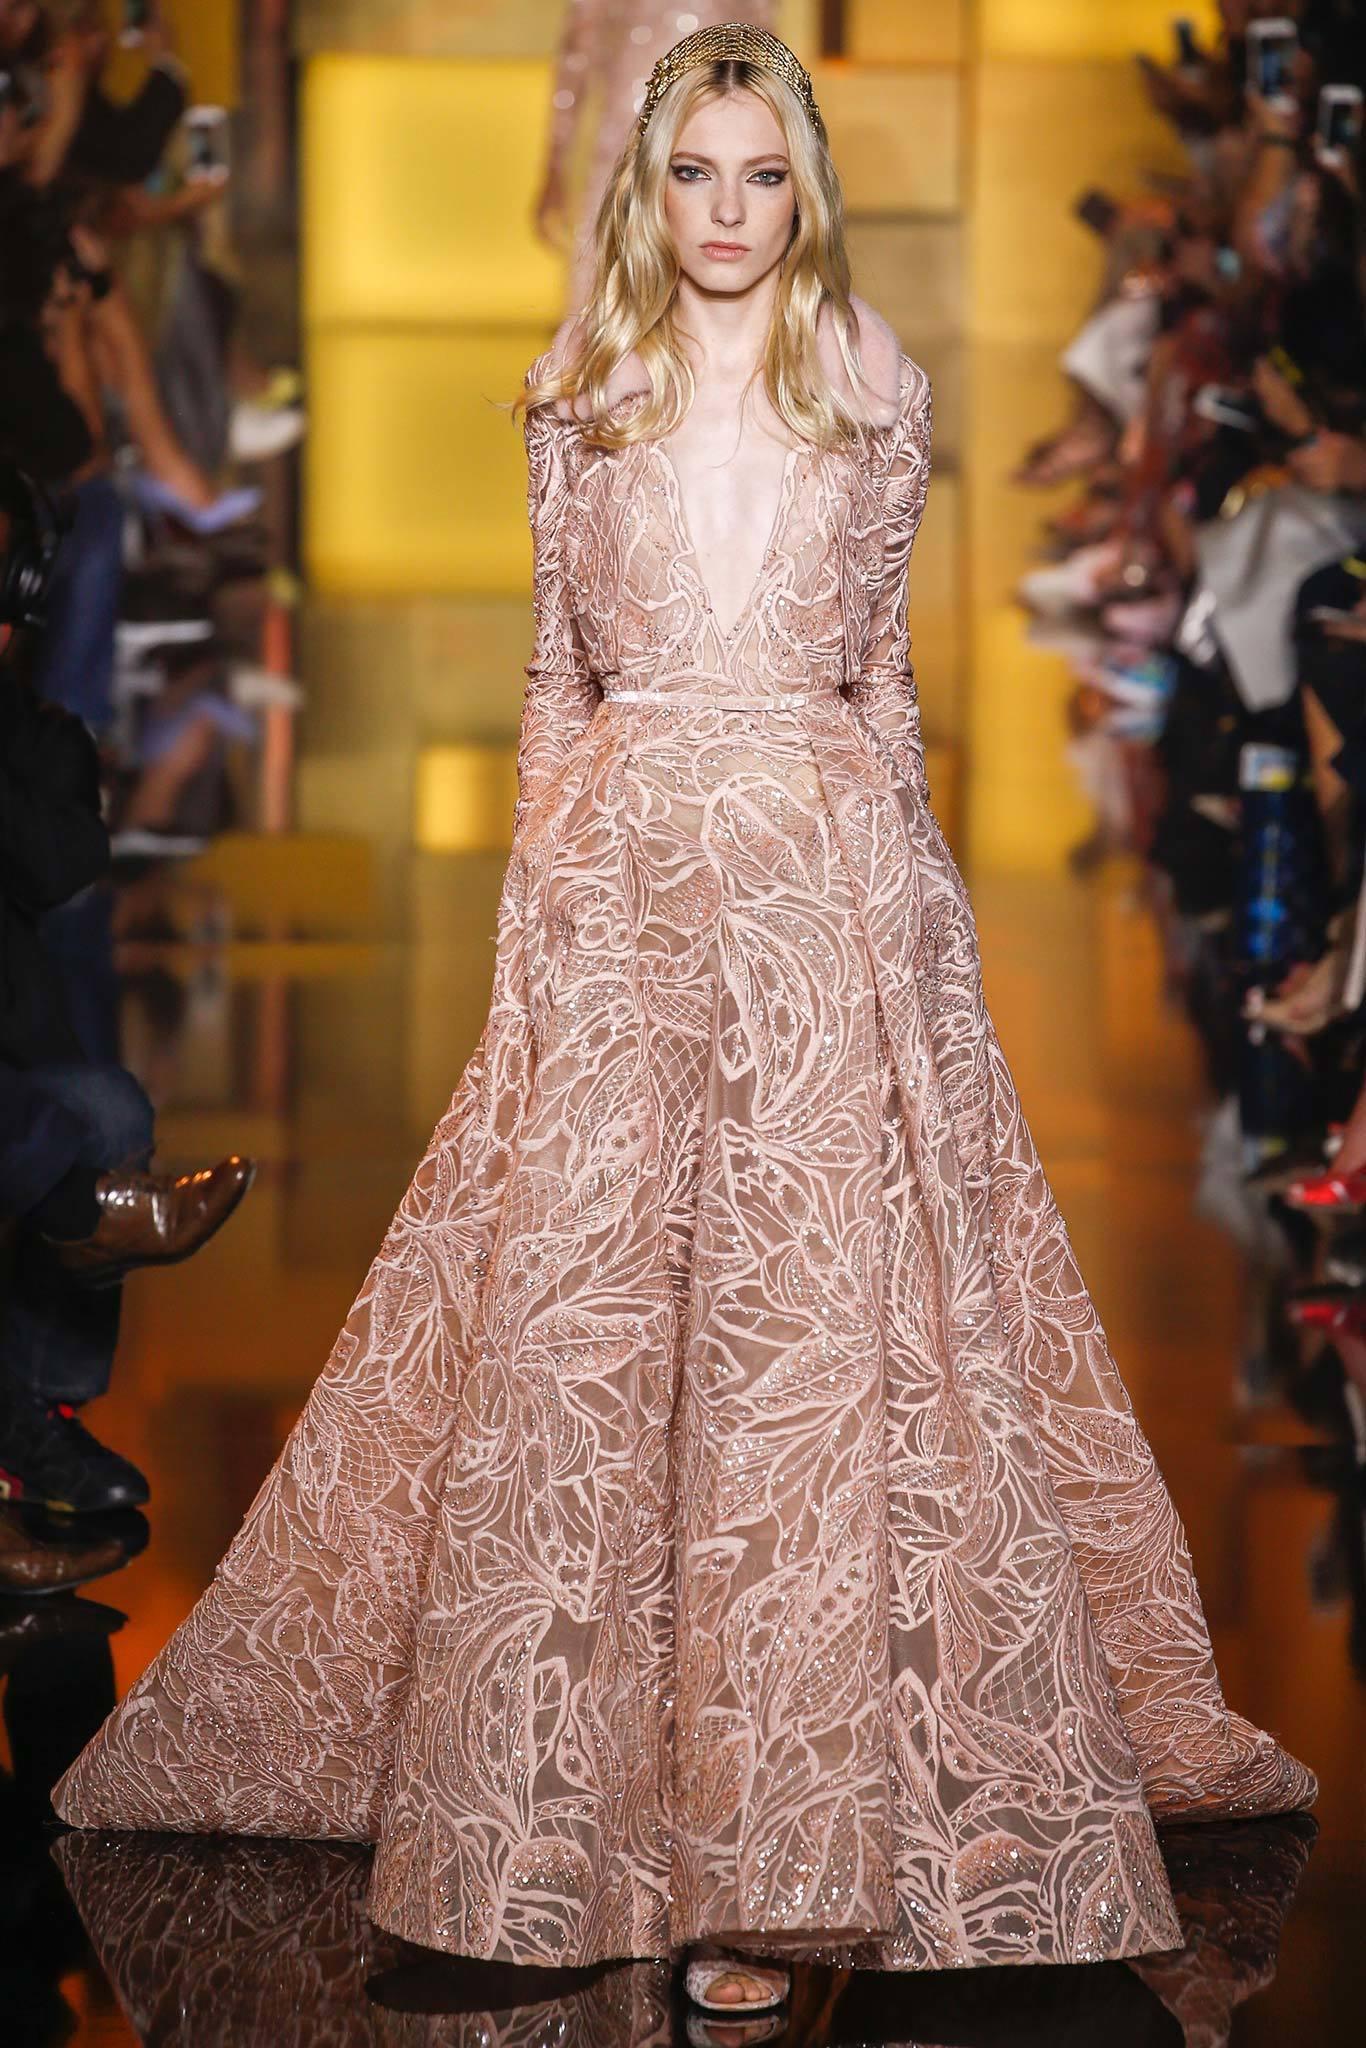 Inspiración para diseñar vestidos de fiesta | Blog de DSIGNO